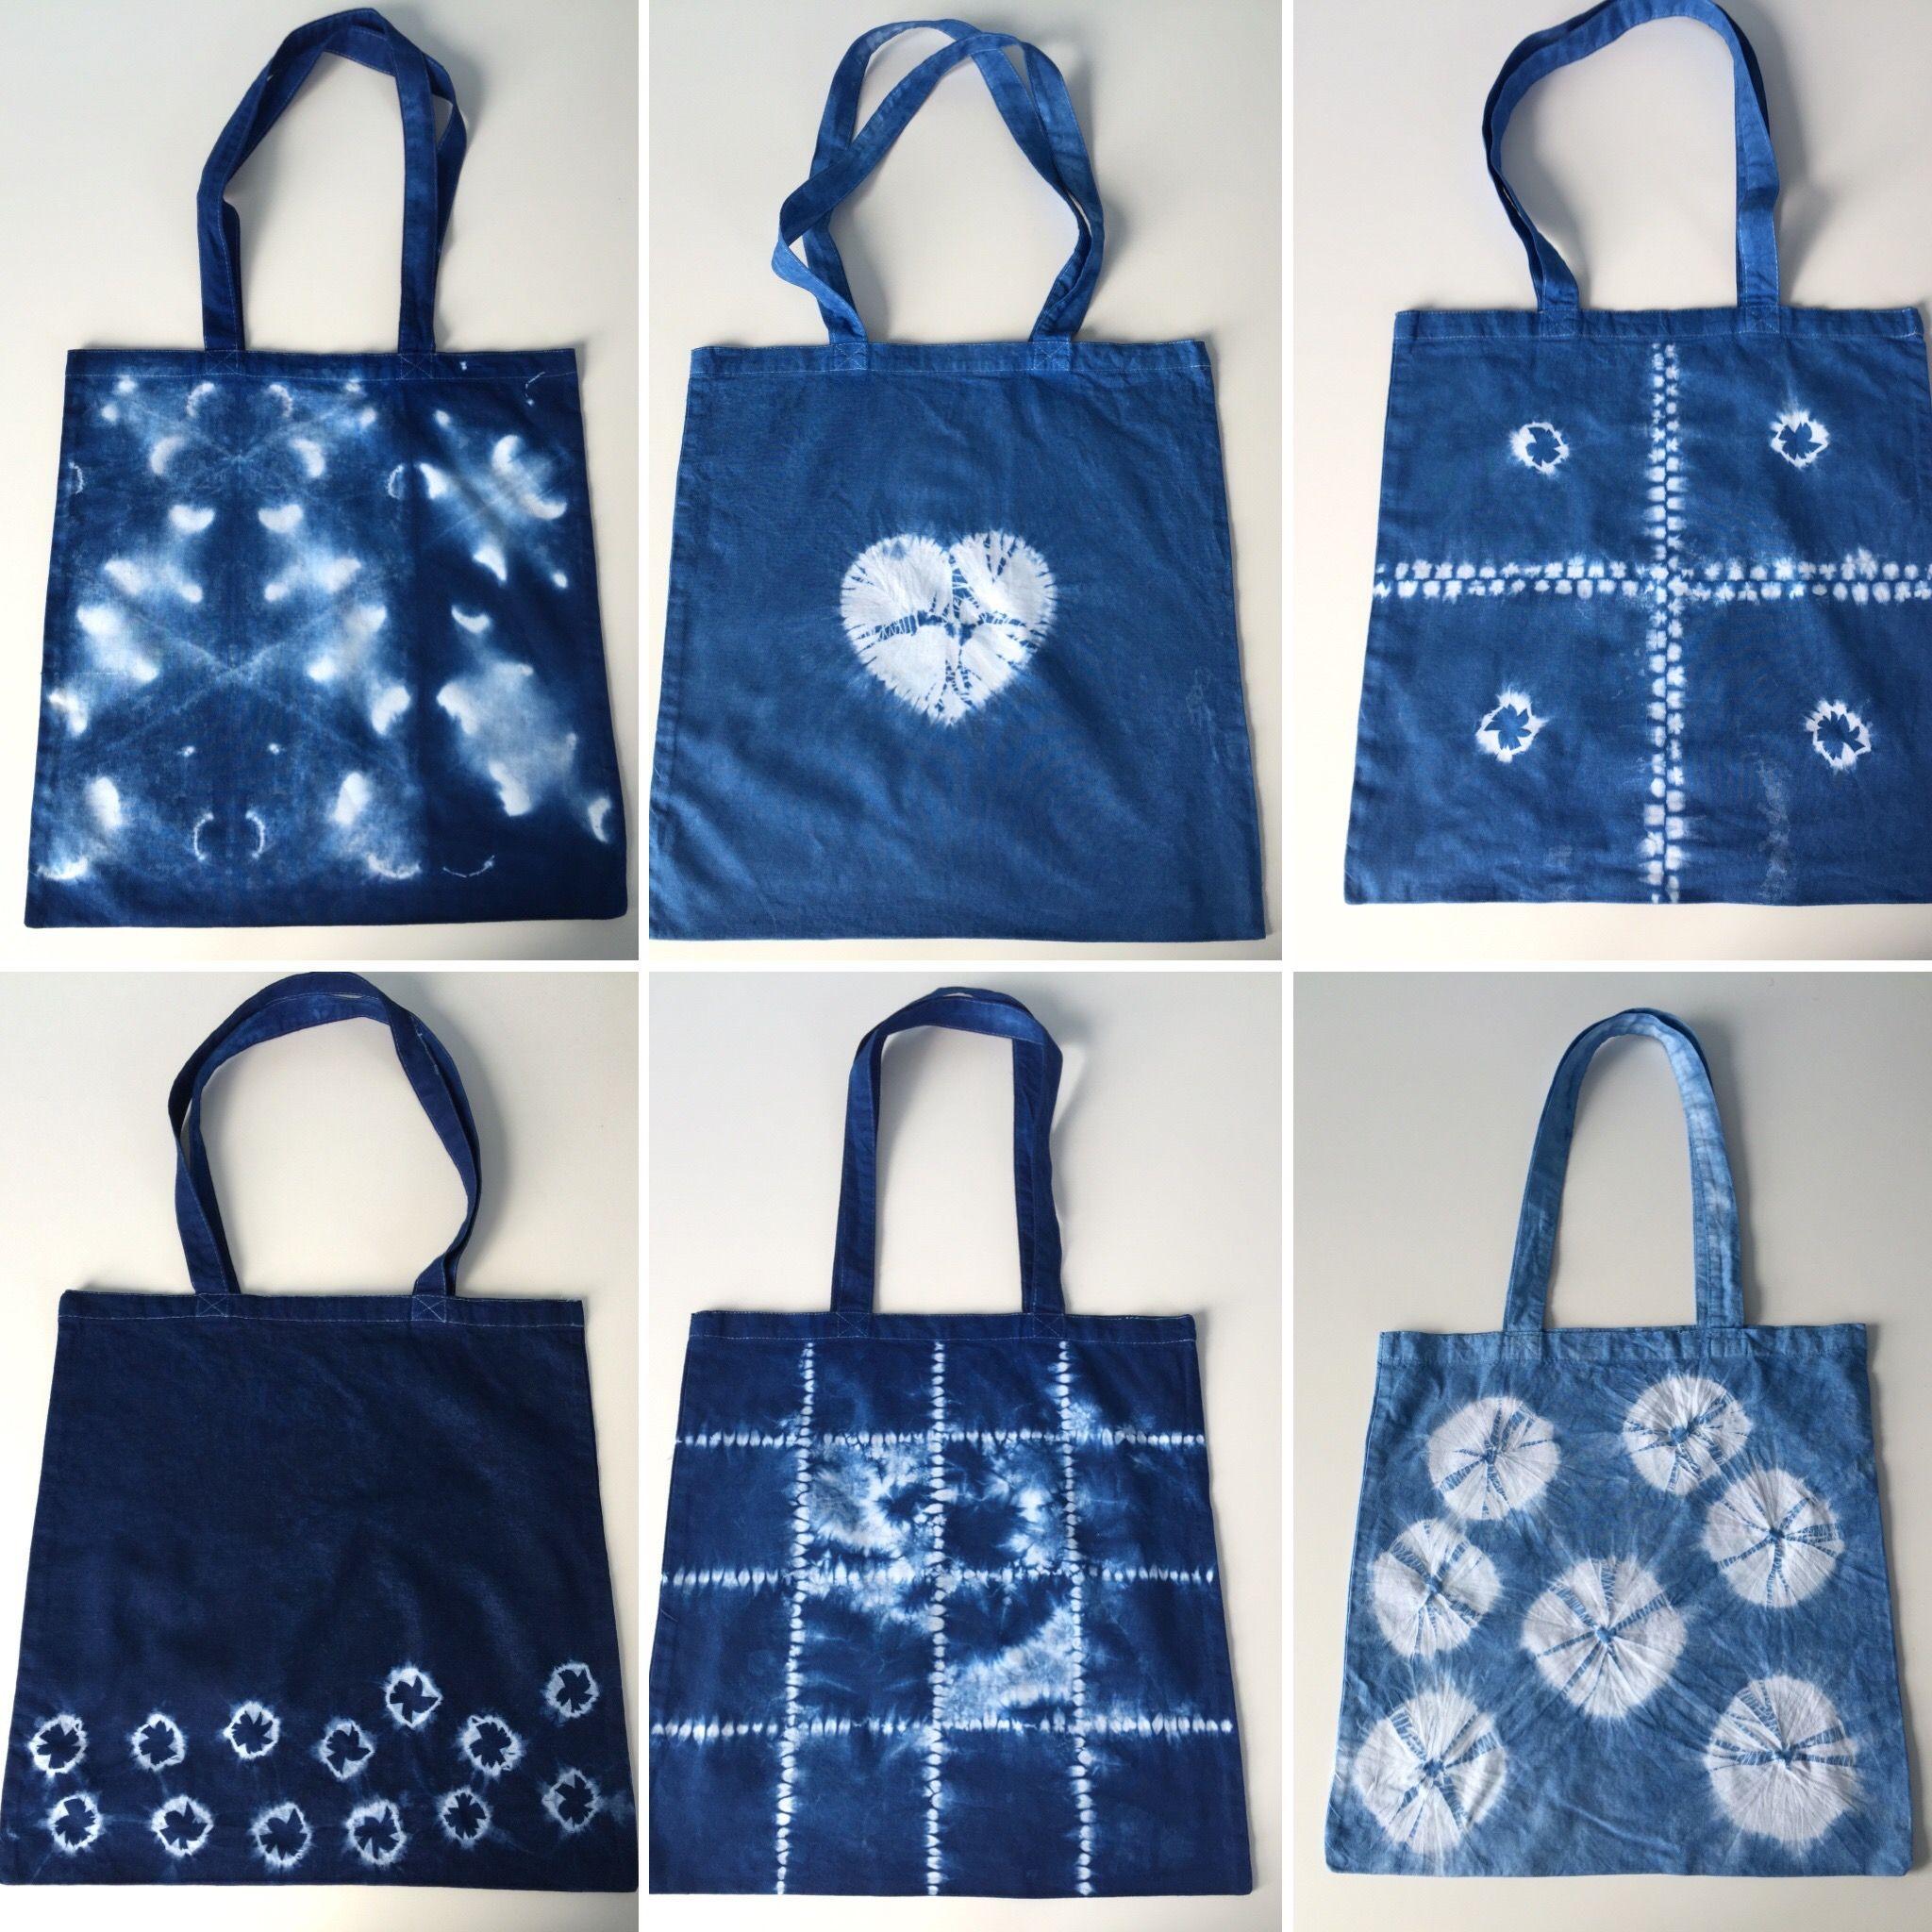 0c88e45c1a68 Six shibori totes - from top left - Kikko folded and stitched ...